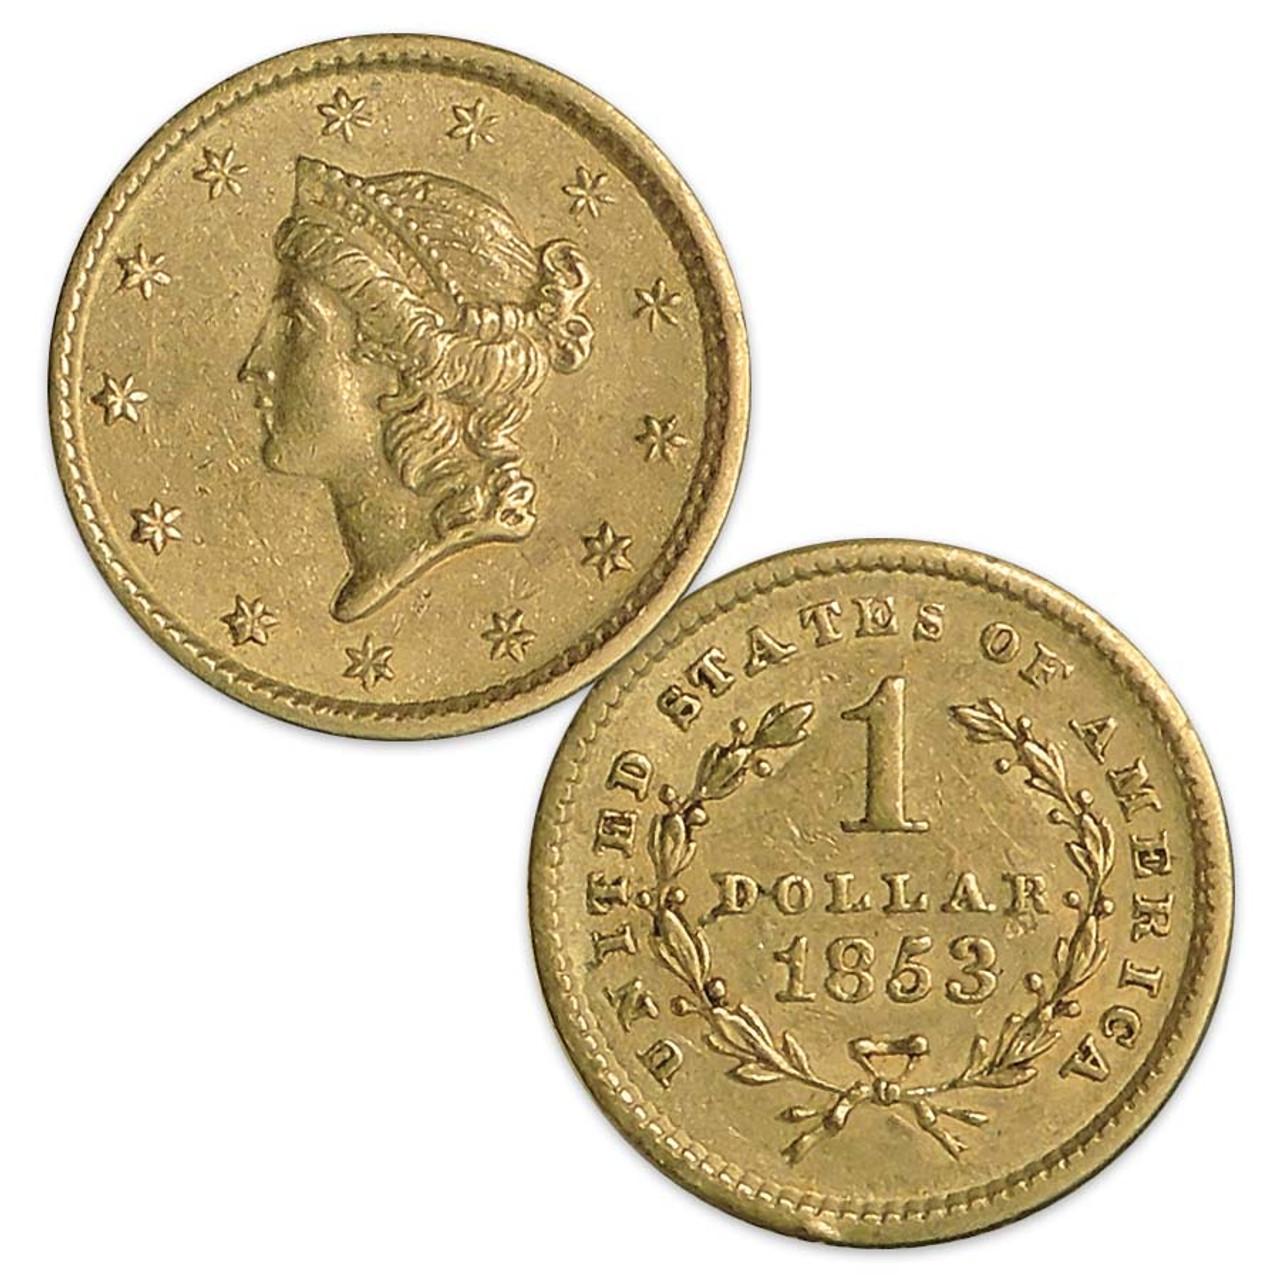 U.S. 1849-1854 Coronet Liberty Gold Dollar Type I Extra Fine